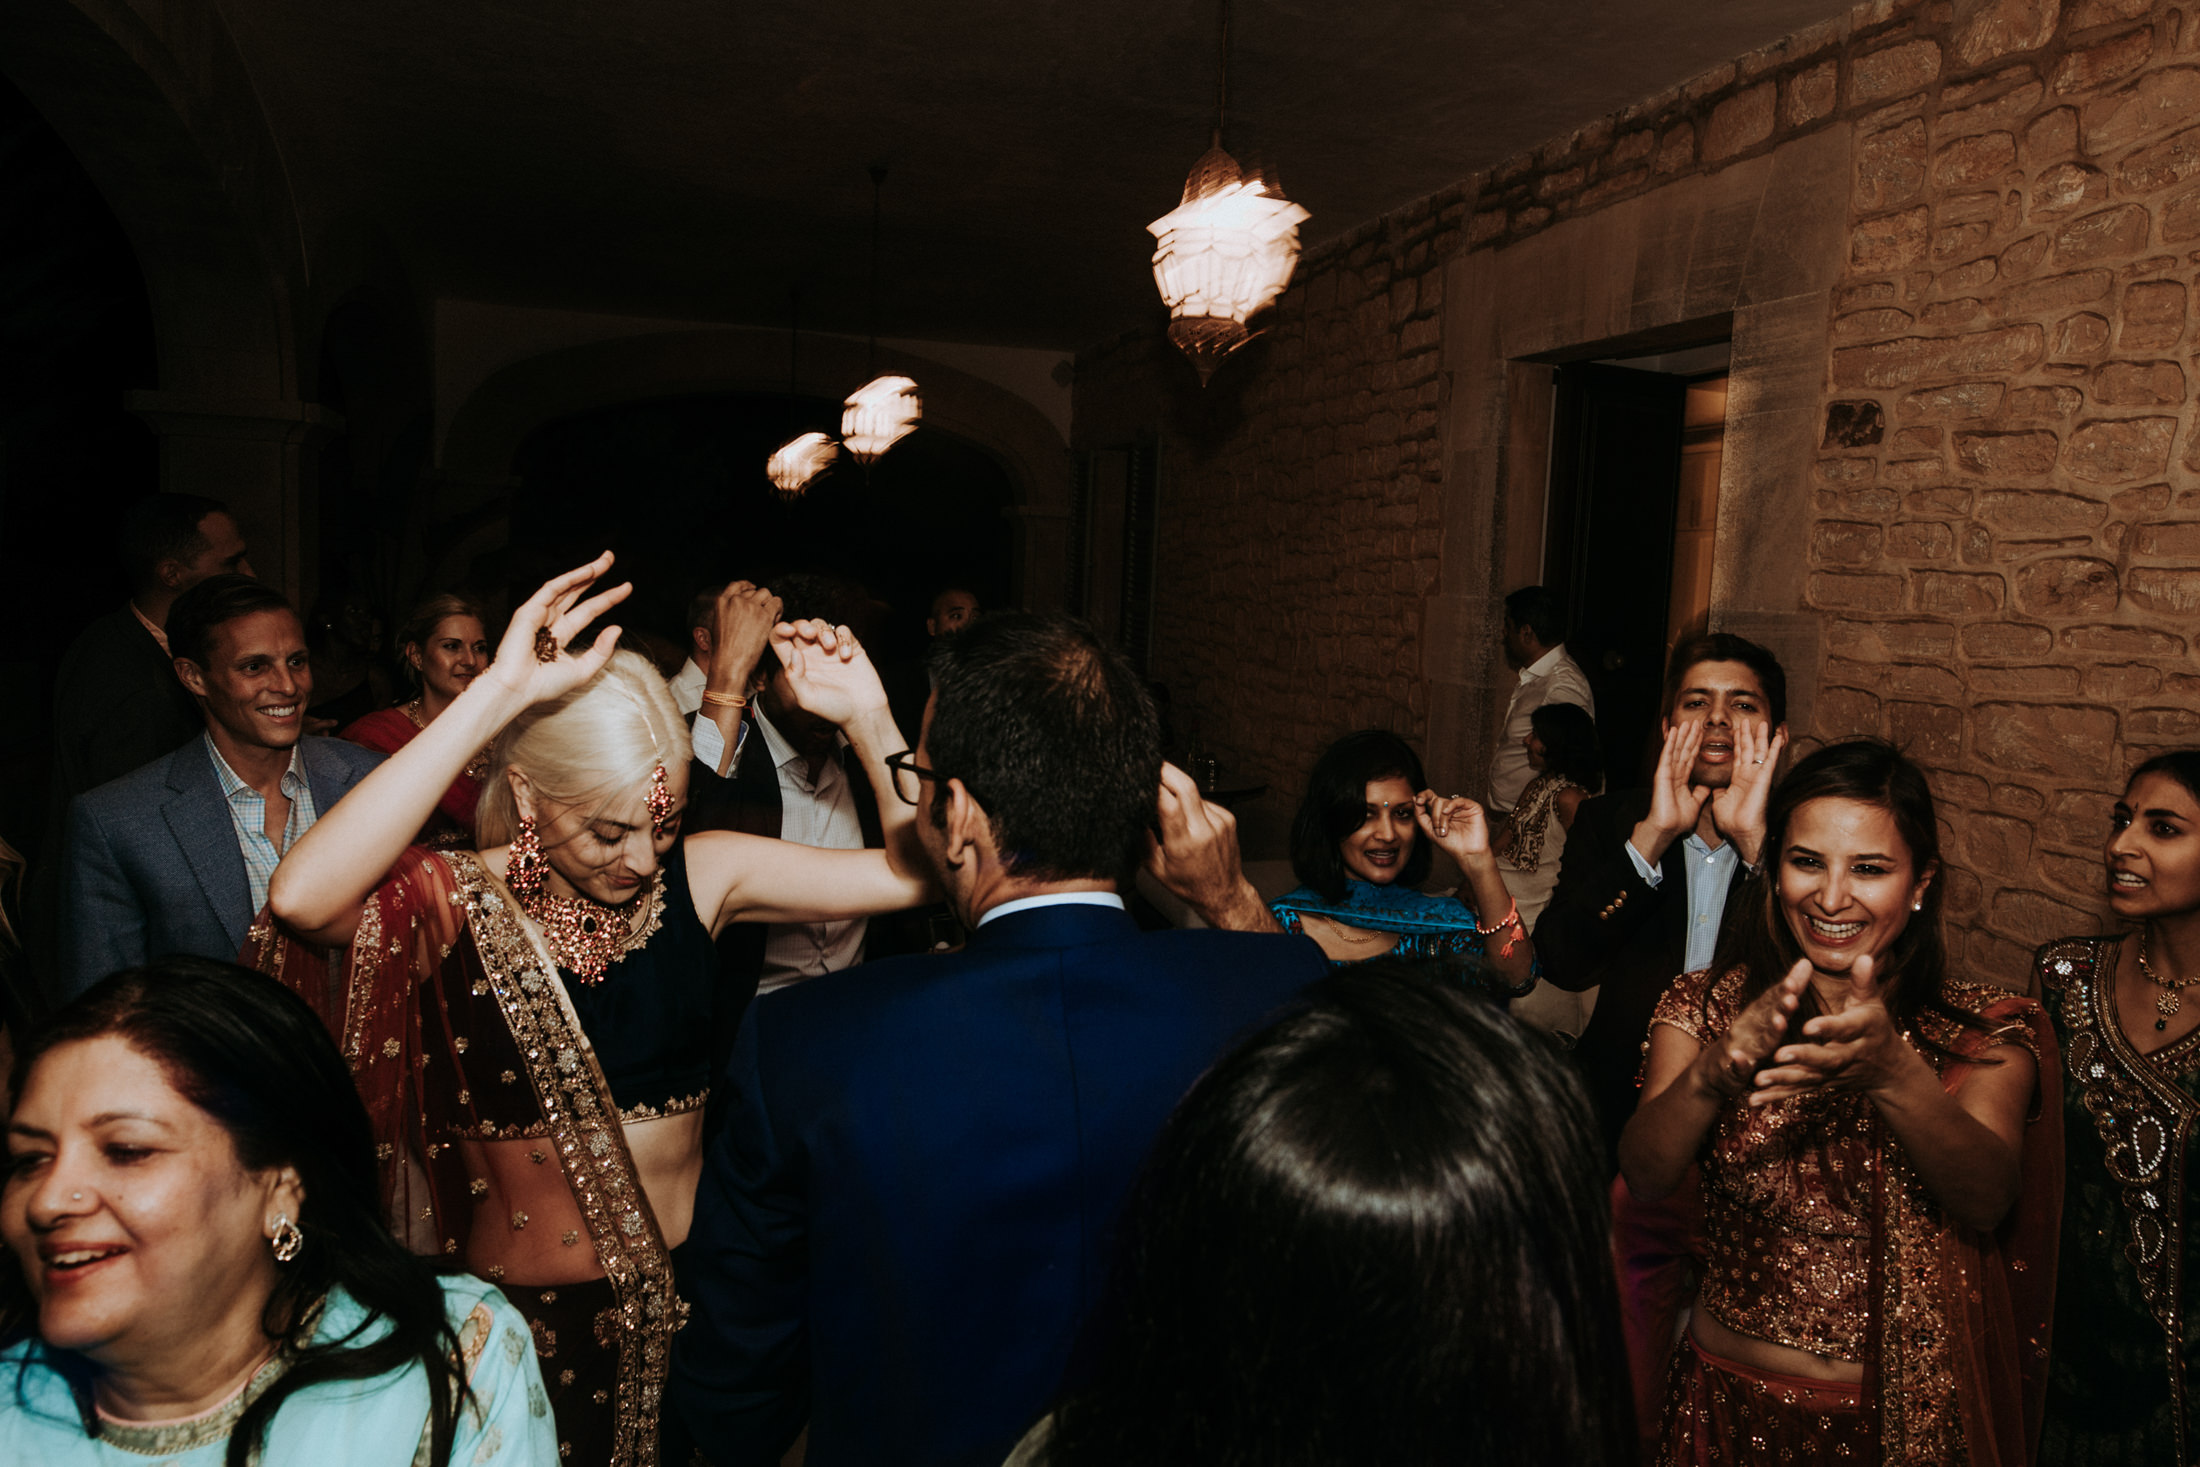 Wedding_Photographer_Mallorca_Daniela-Marquardt_Photography_New_York_Iceland_Tuscany_Santorini_Portugal_Austria_Bavaria_Elopement_Hochzeitsfotograf_AntjeRajat1_66